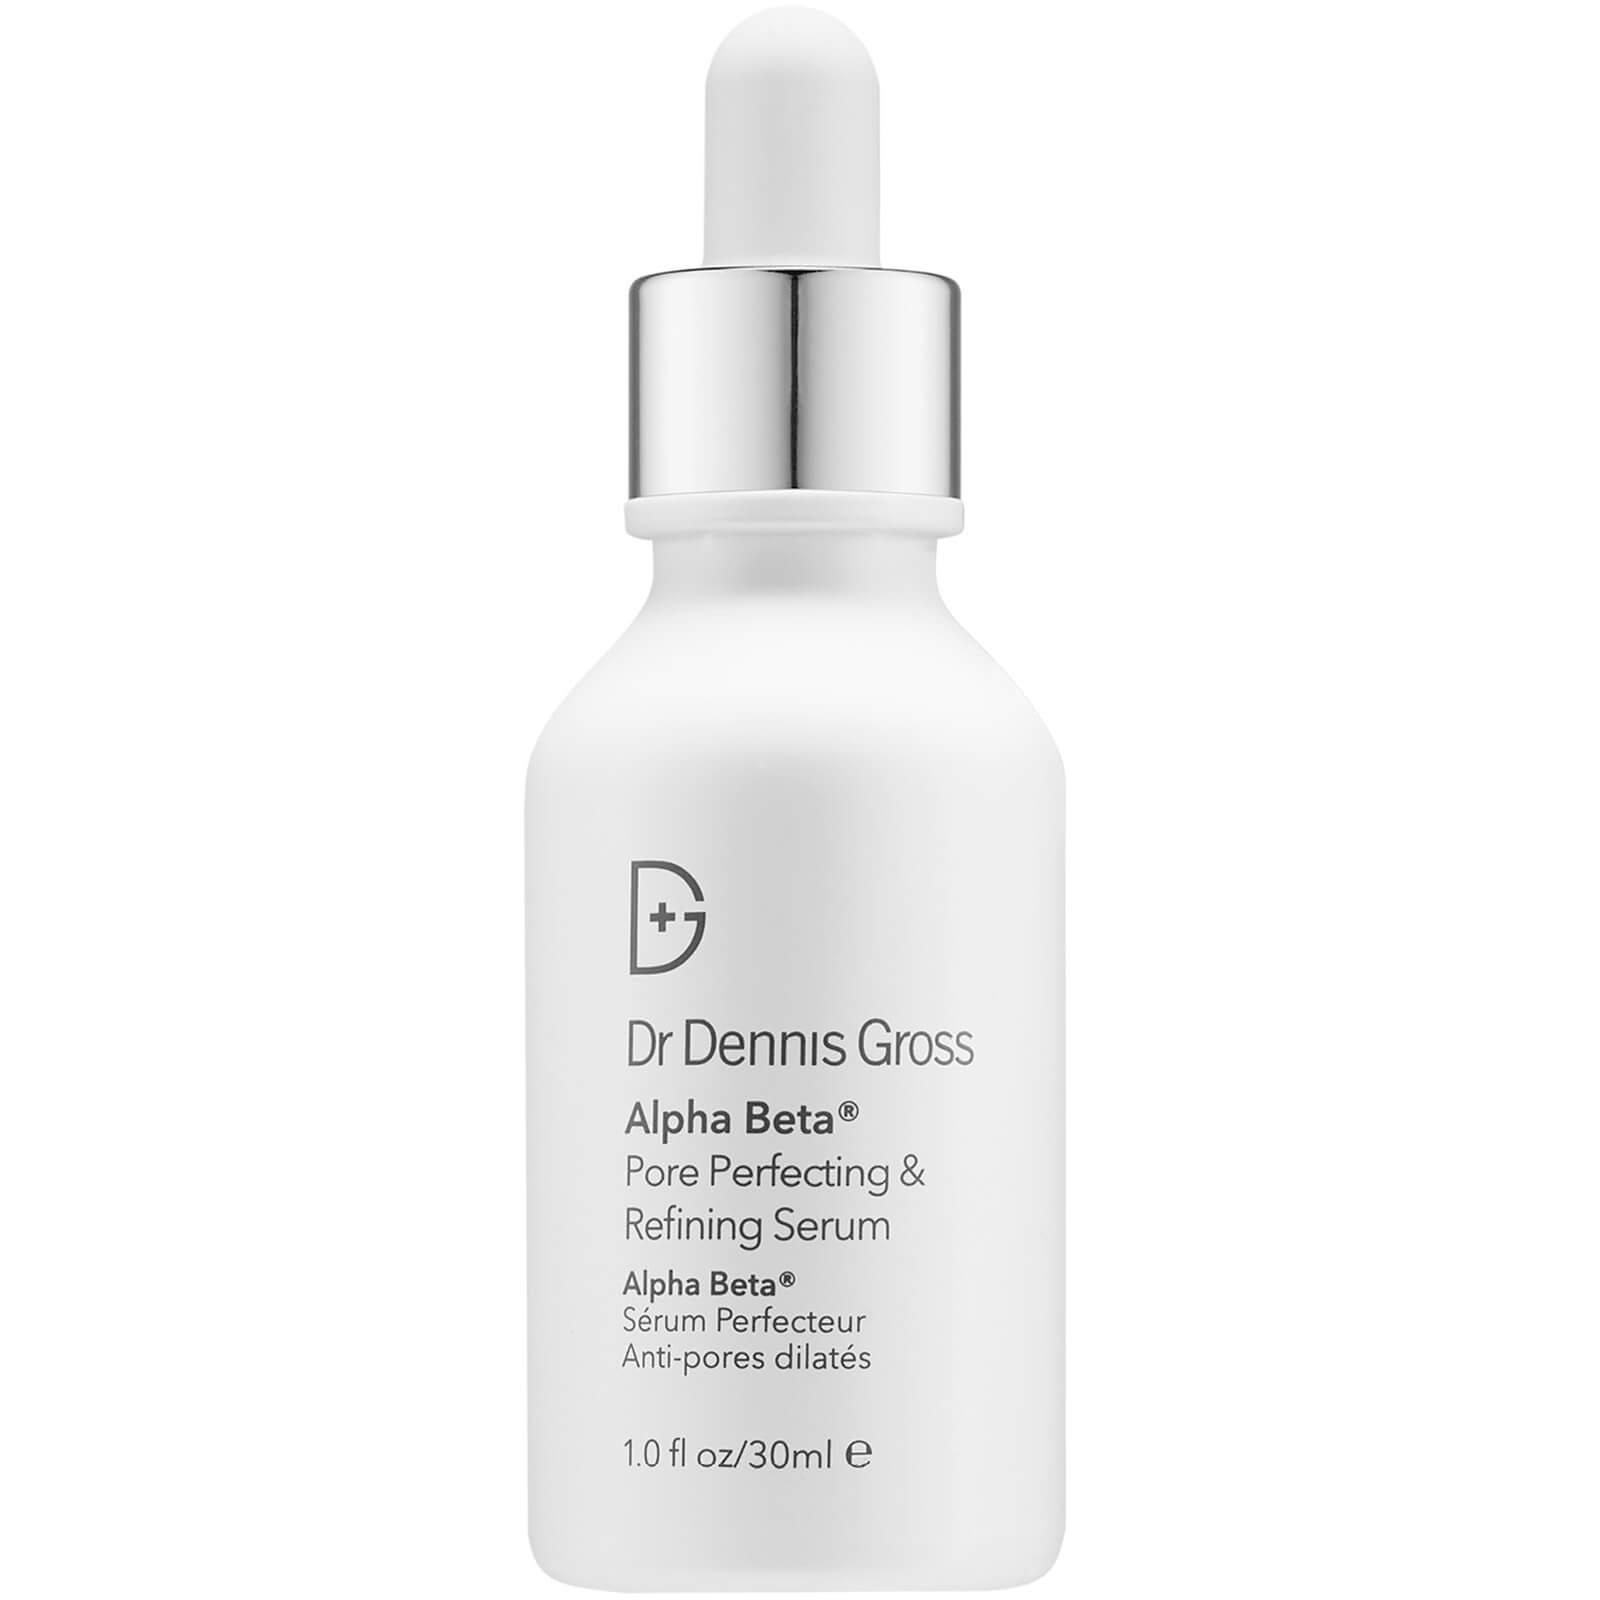 Купить Dr Dennis Gross Skincare Alpha Beta Pore Perfecting & Refining Serum 30ml